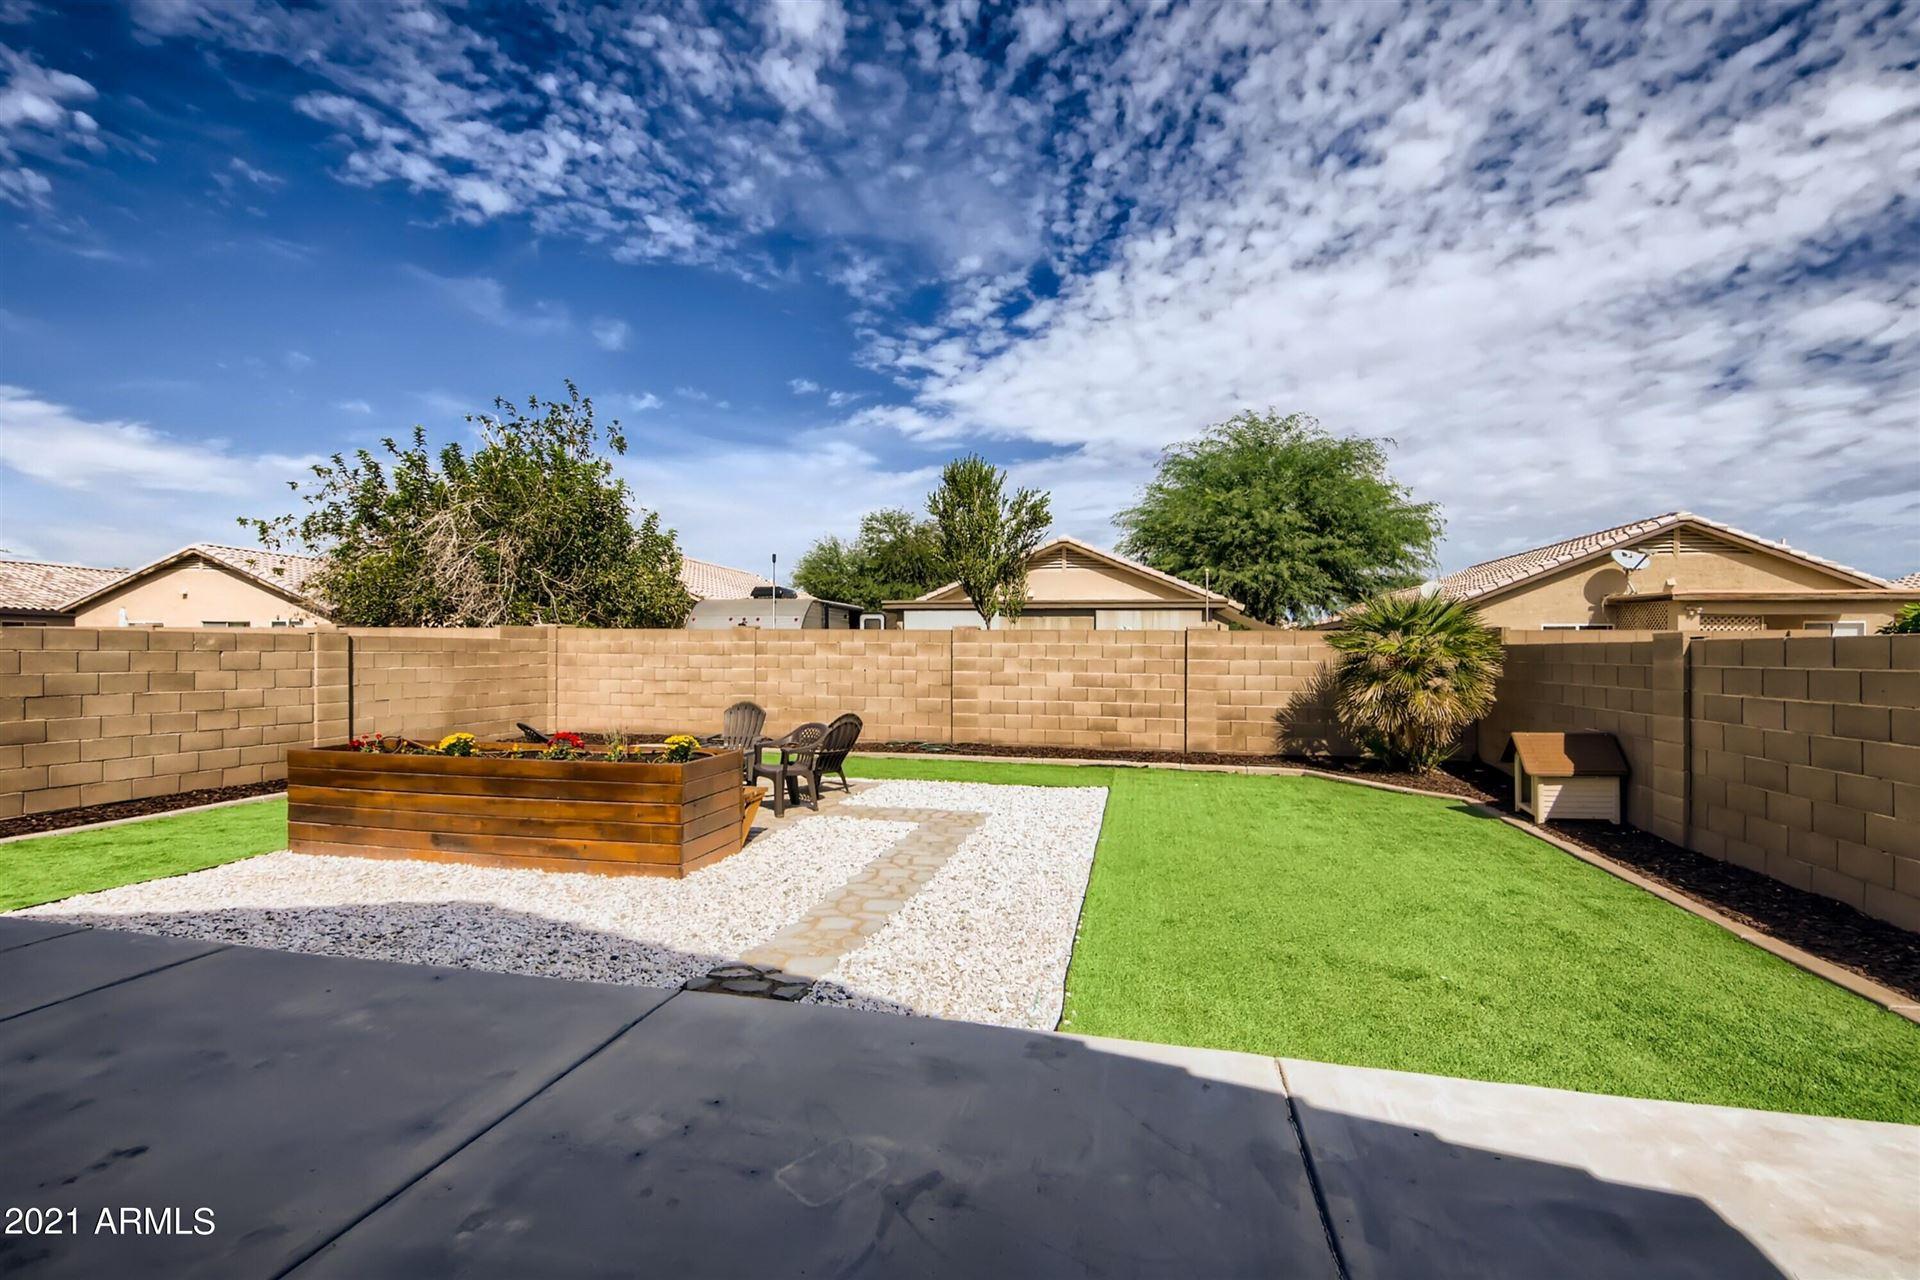 Photo of 11950 W Larkspur Road, El Mirage, AZ 85335 (MLS # 6304977)